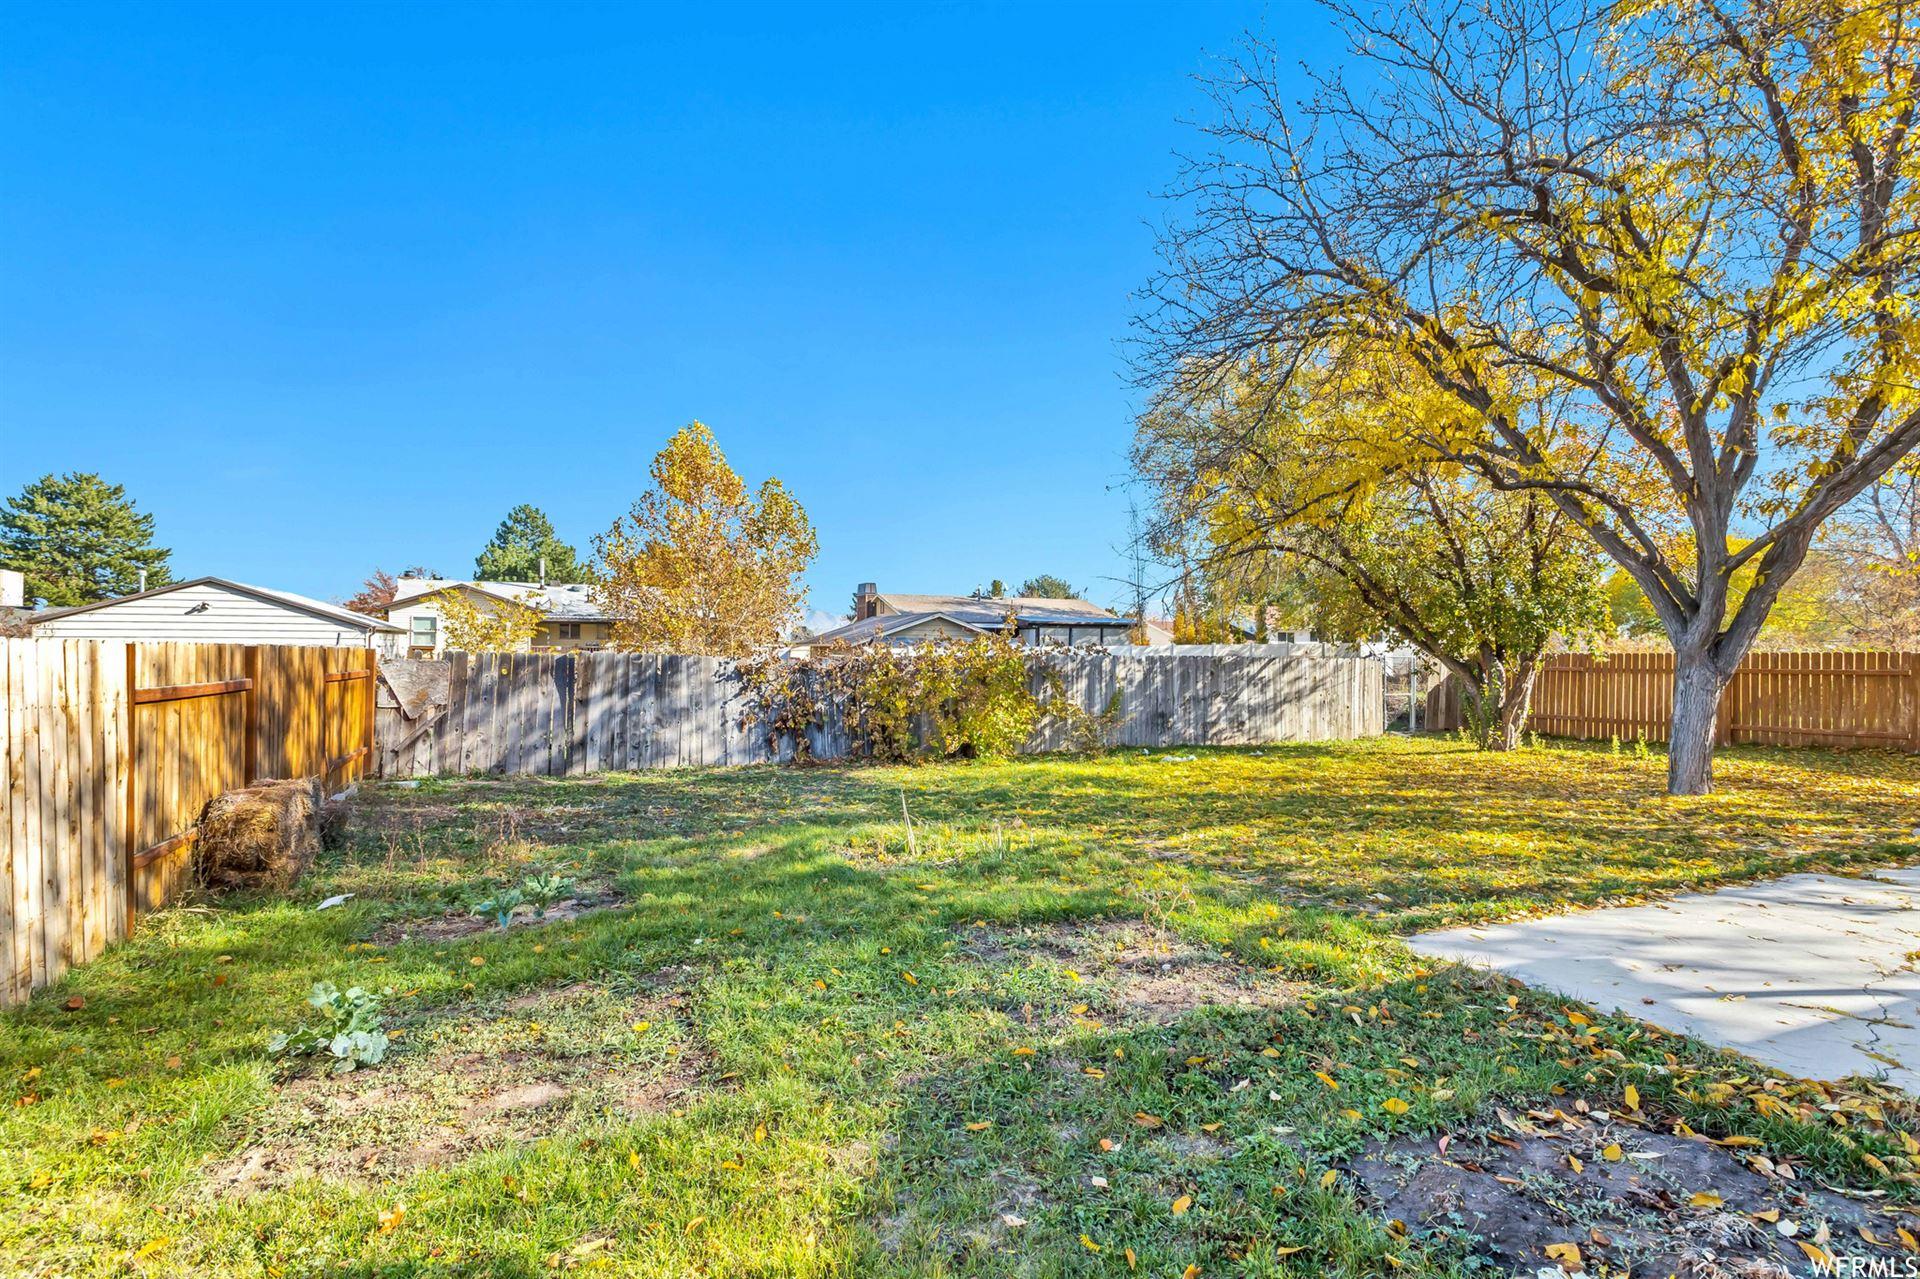 Photo of 3448 W HARRISONWOOD S DR, West Valley City, UT 84119 (MLS # 1776117)